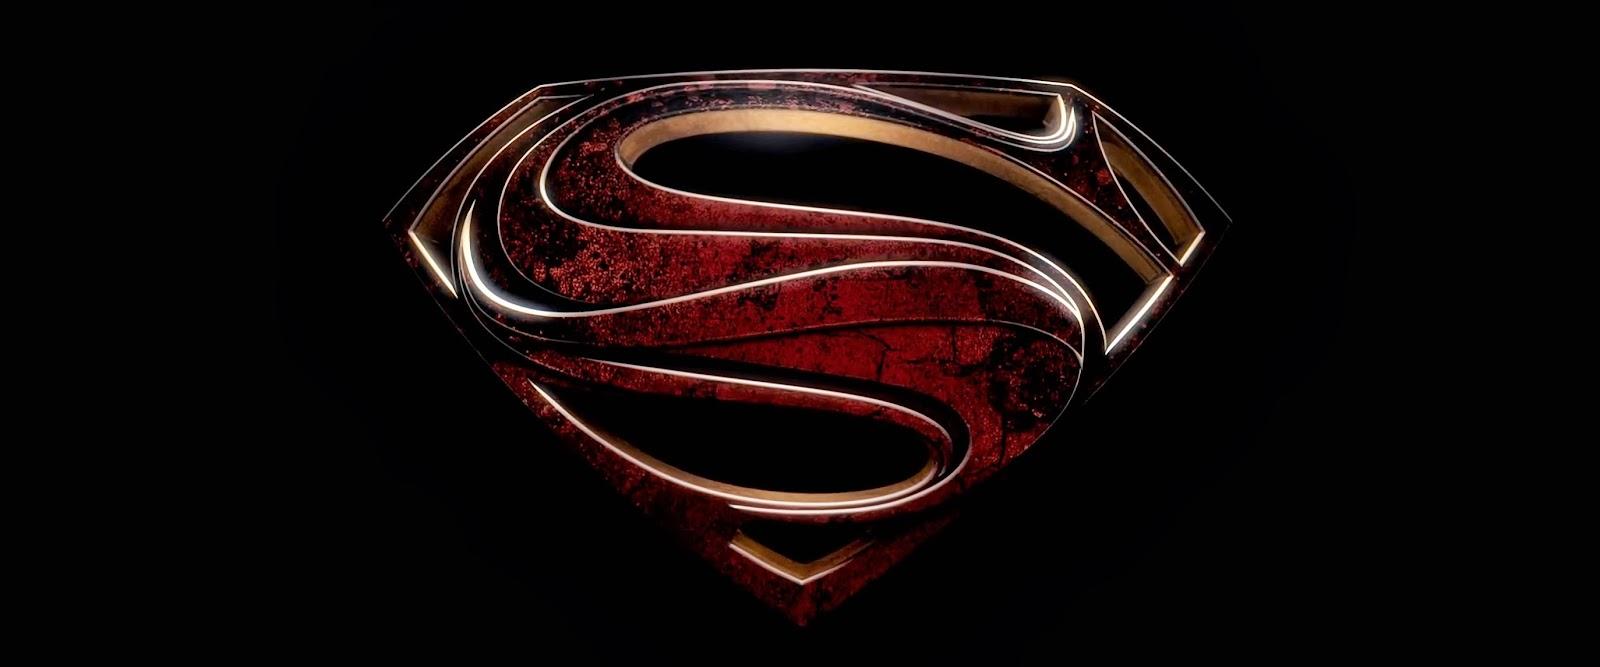 Killzone Shadow Fall Full Hd Wallpaper Wallpapers Hd Fondos De Pantalla De Superman Man Of